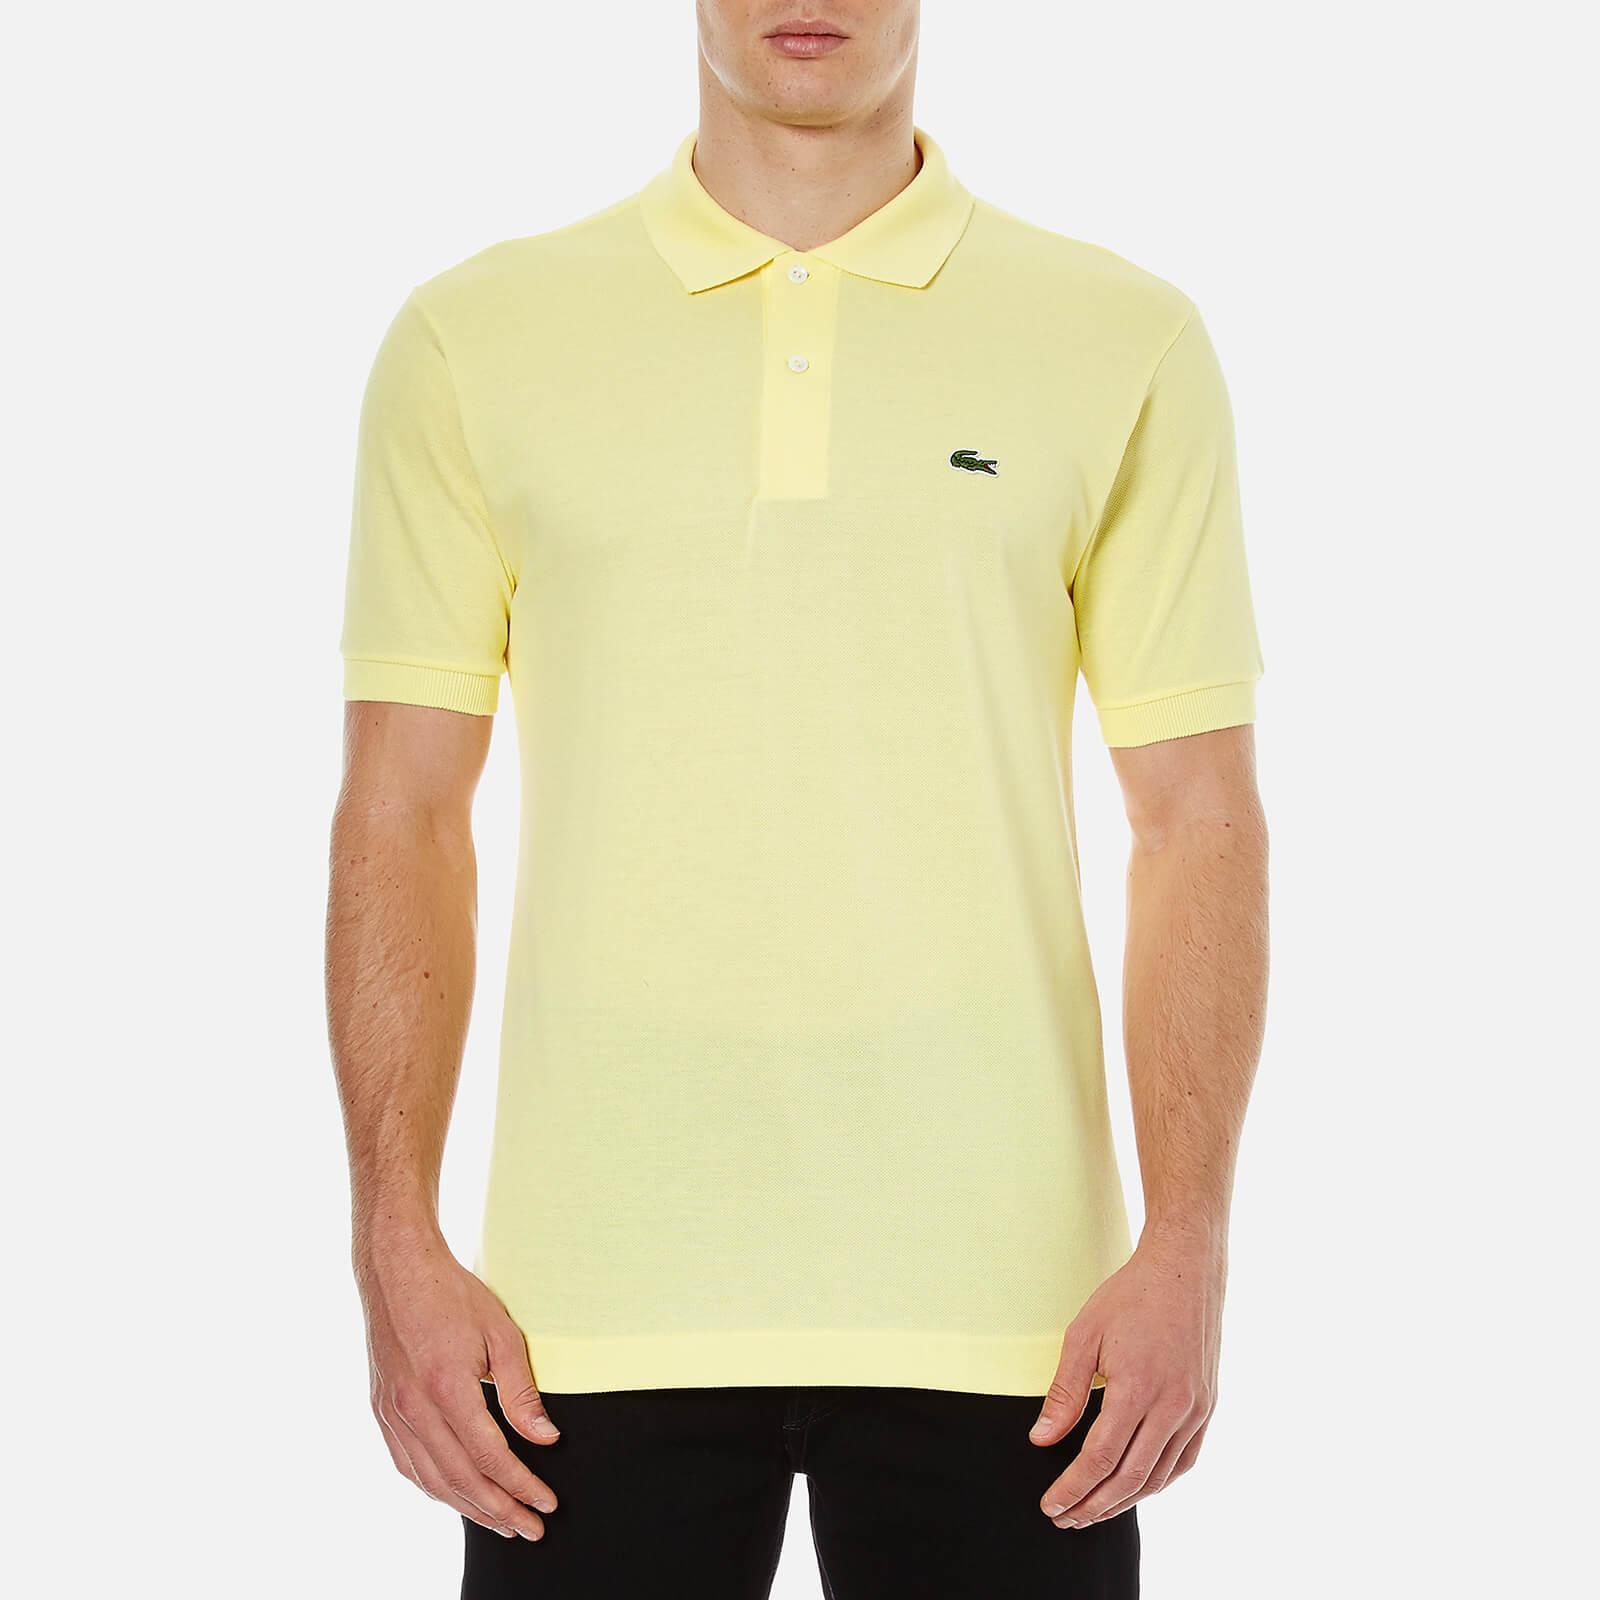 54f1ee1f9d18 Amazon Uk Lacoste Polo Shirts